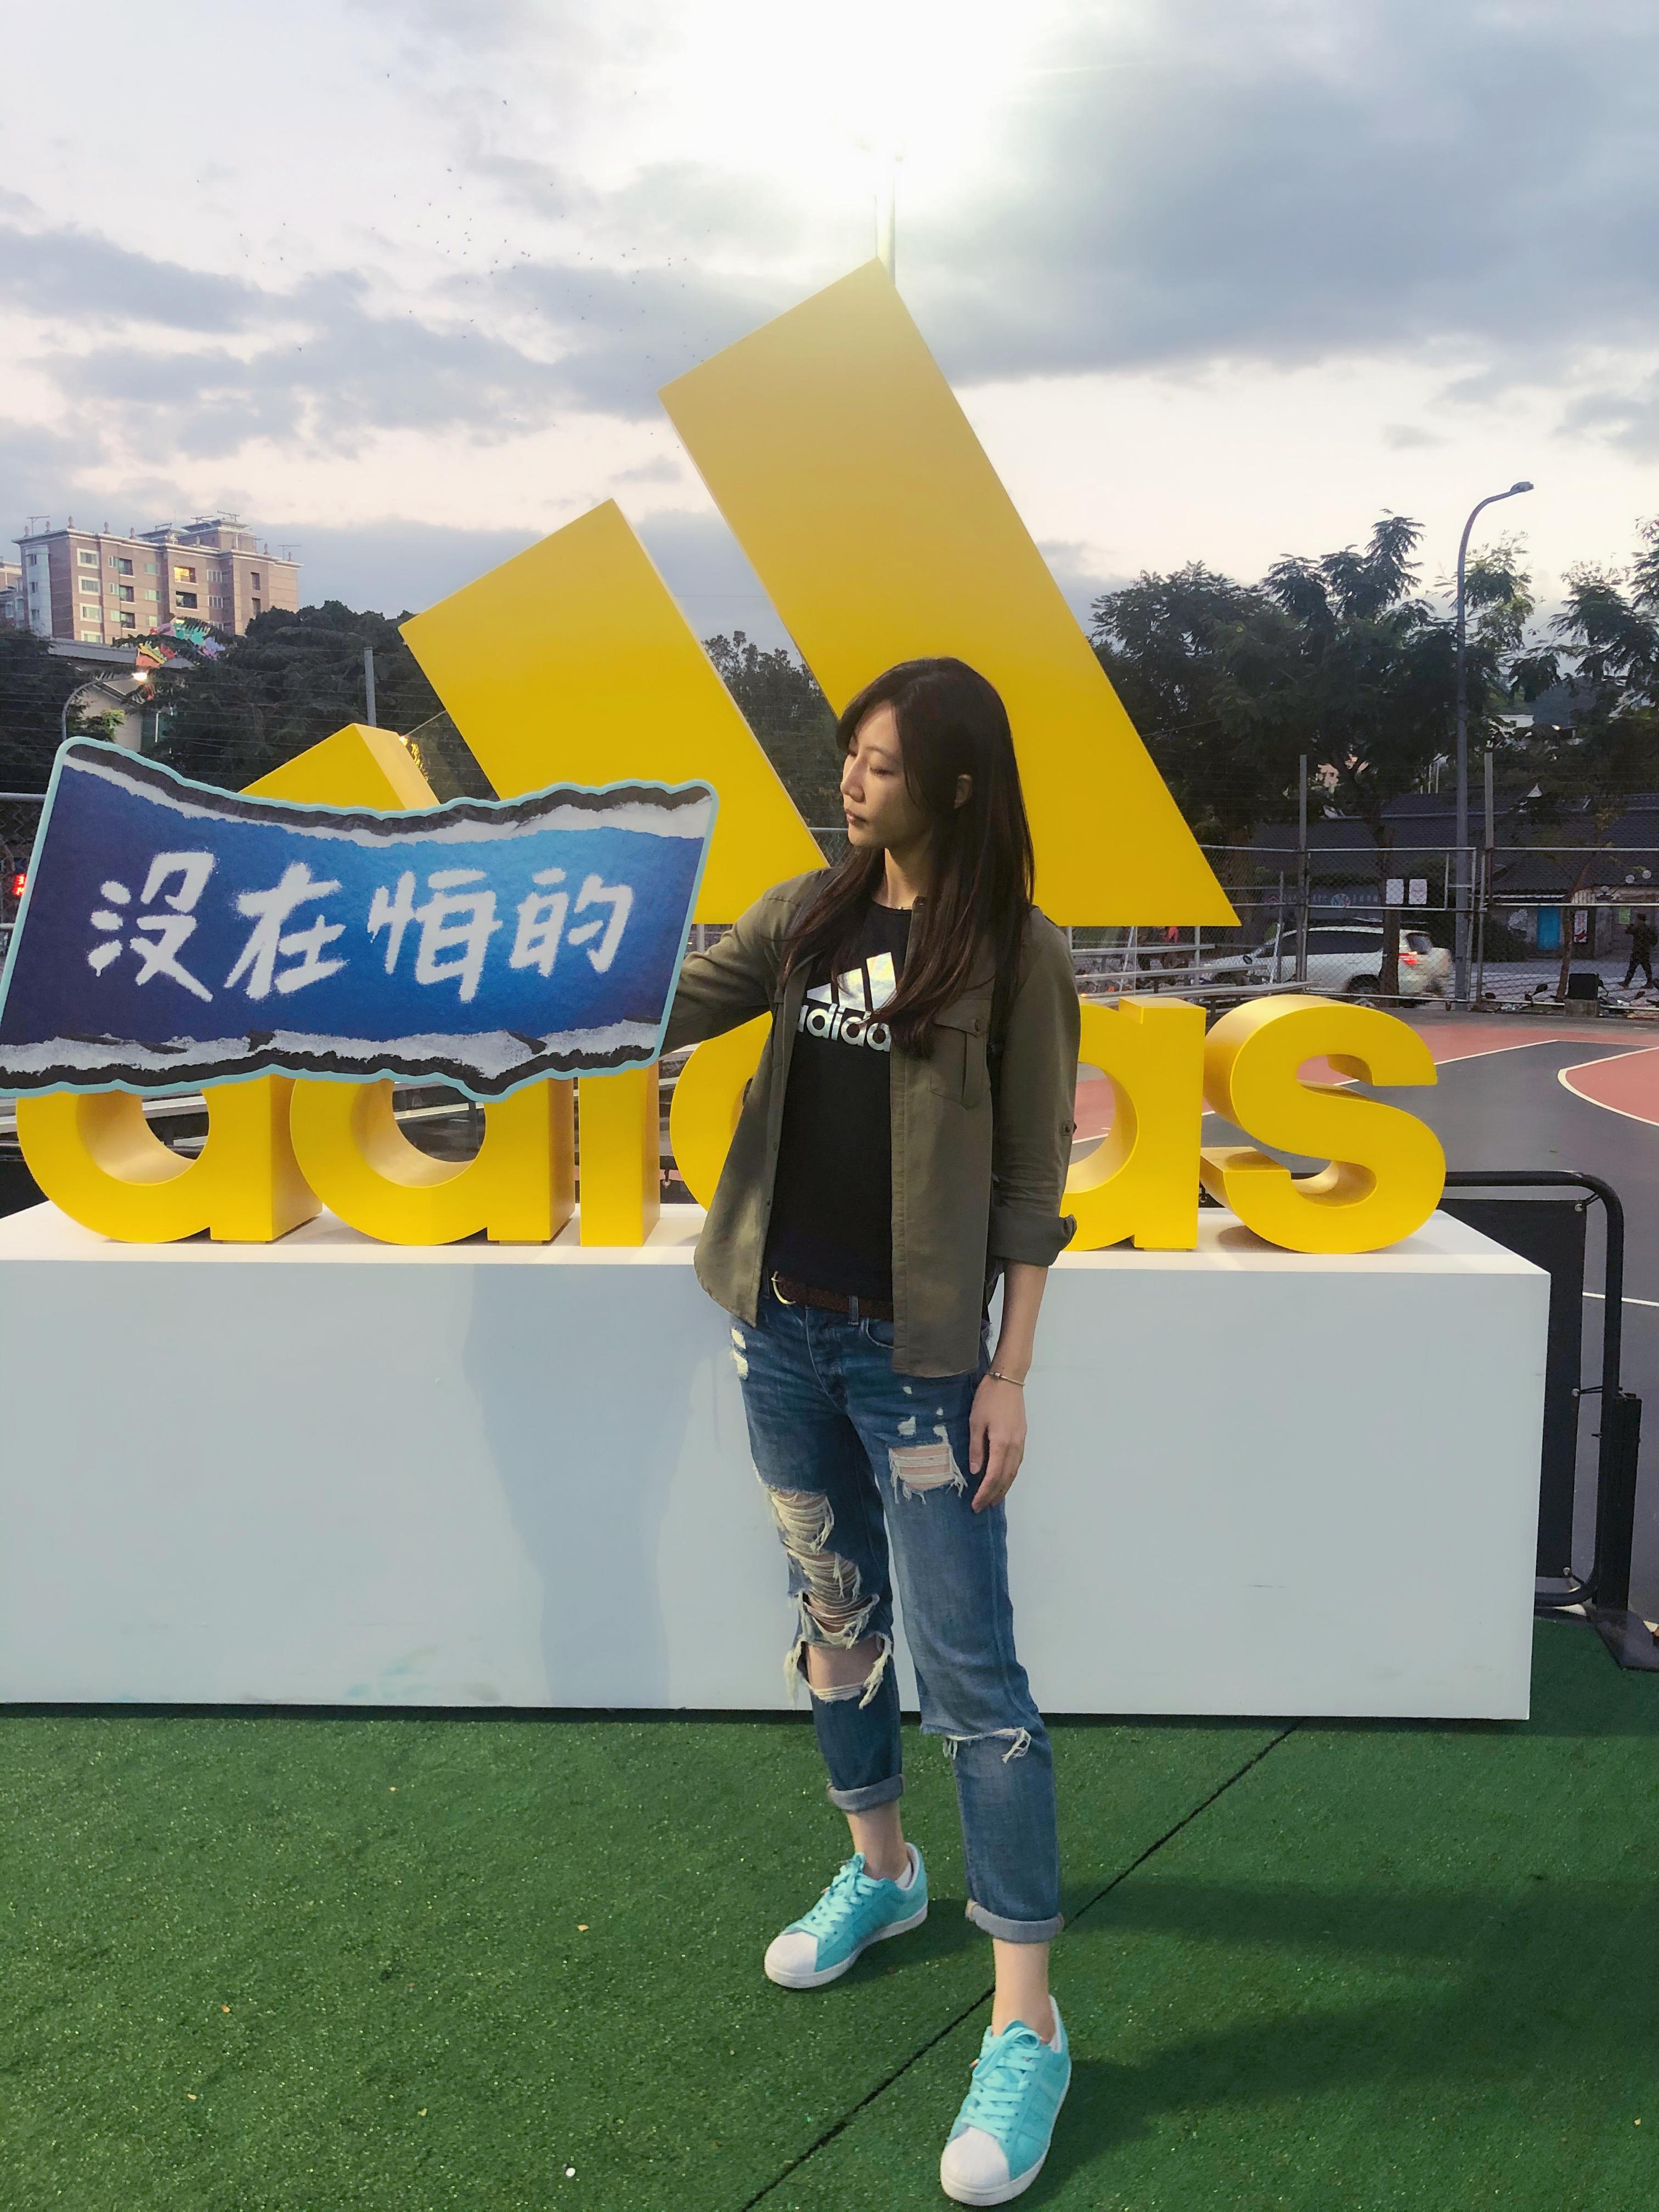 HBL南湖女籃總教練孫韻筌擁有面對未來的勇氣!孫韻筌提供